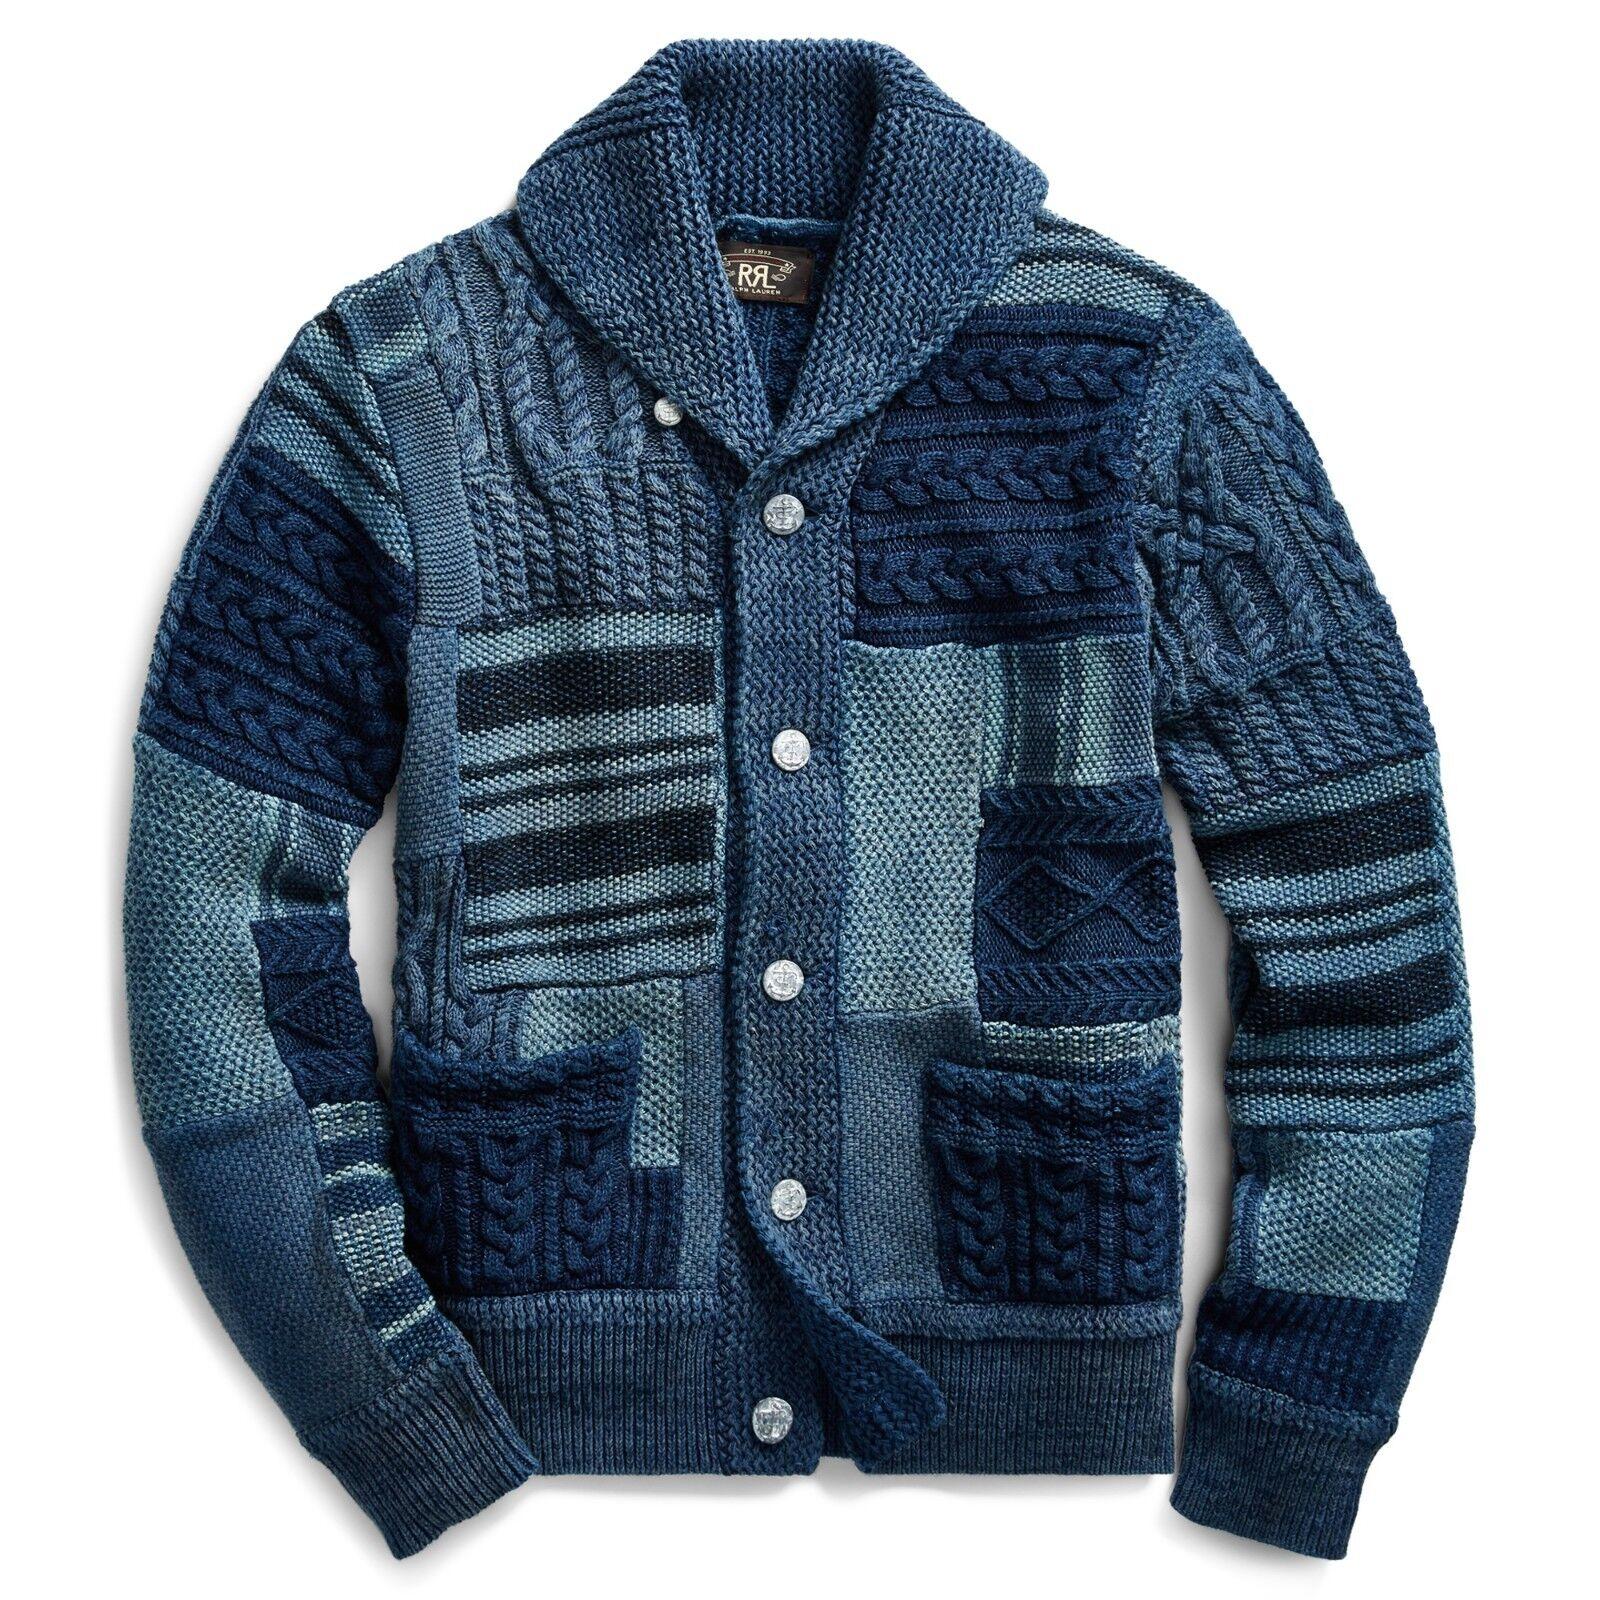 RRL Ralph Lauren Indigo Dyed Hand Patchwork Cotton Shawl Collar Cardigan NWT S